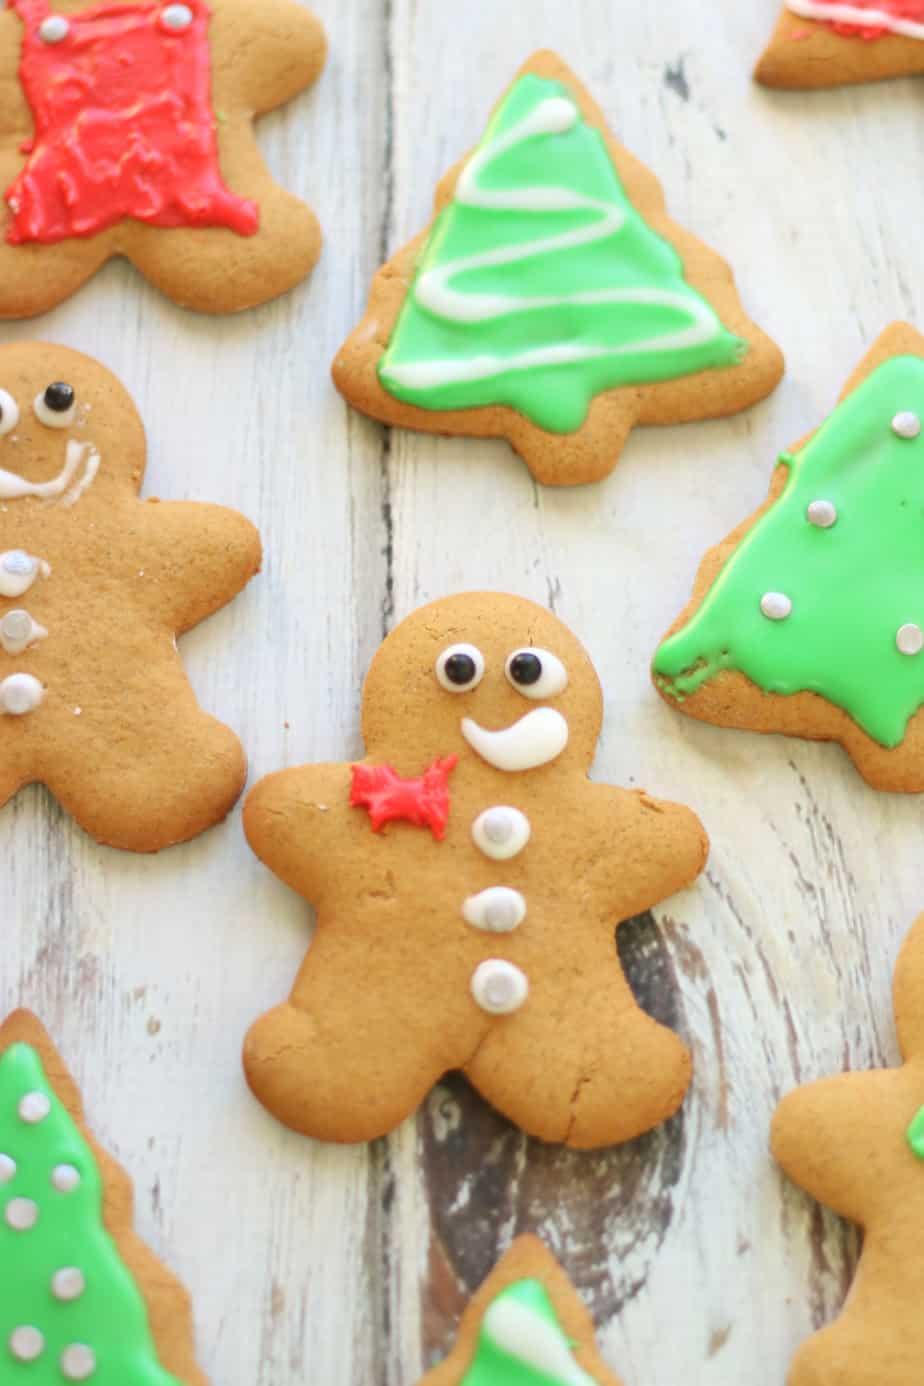 Gluten Free Gingerbread Cookies